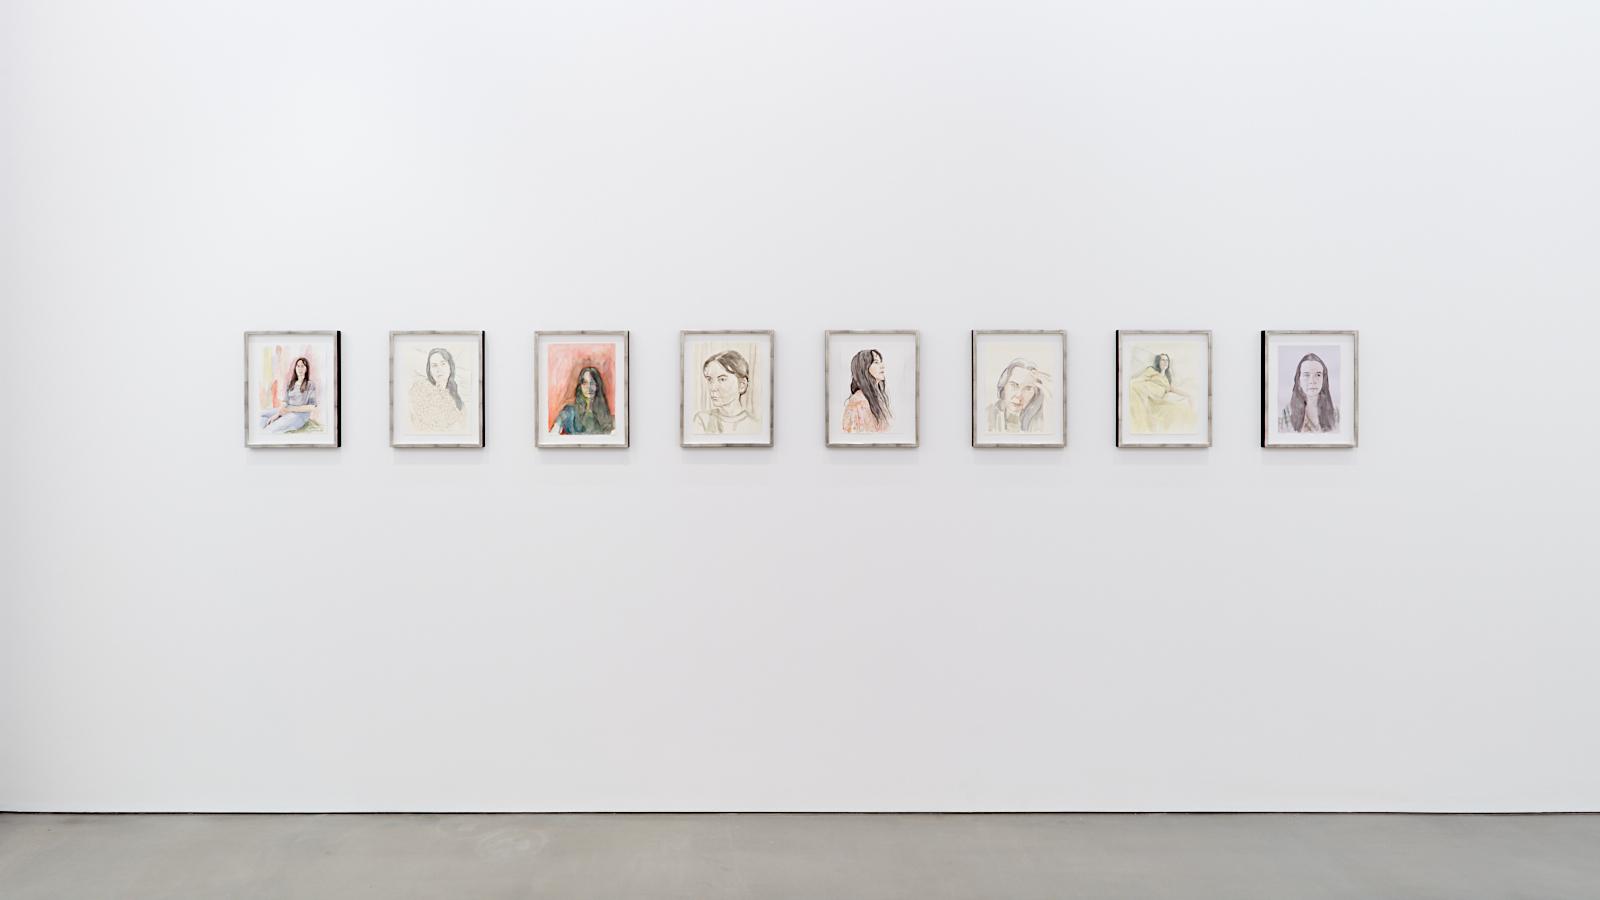 Gillian Wearing, Lockdown. Exhibition view: Maureen Paley, London 2020